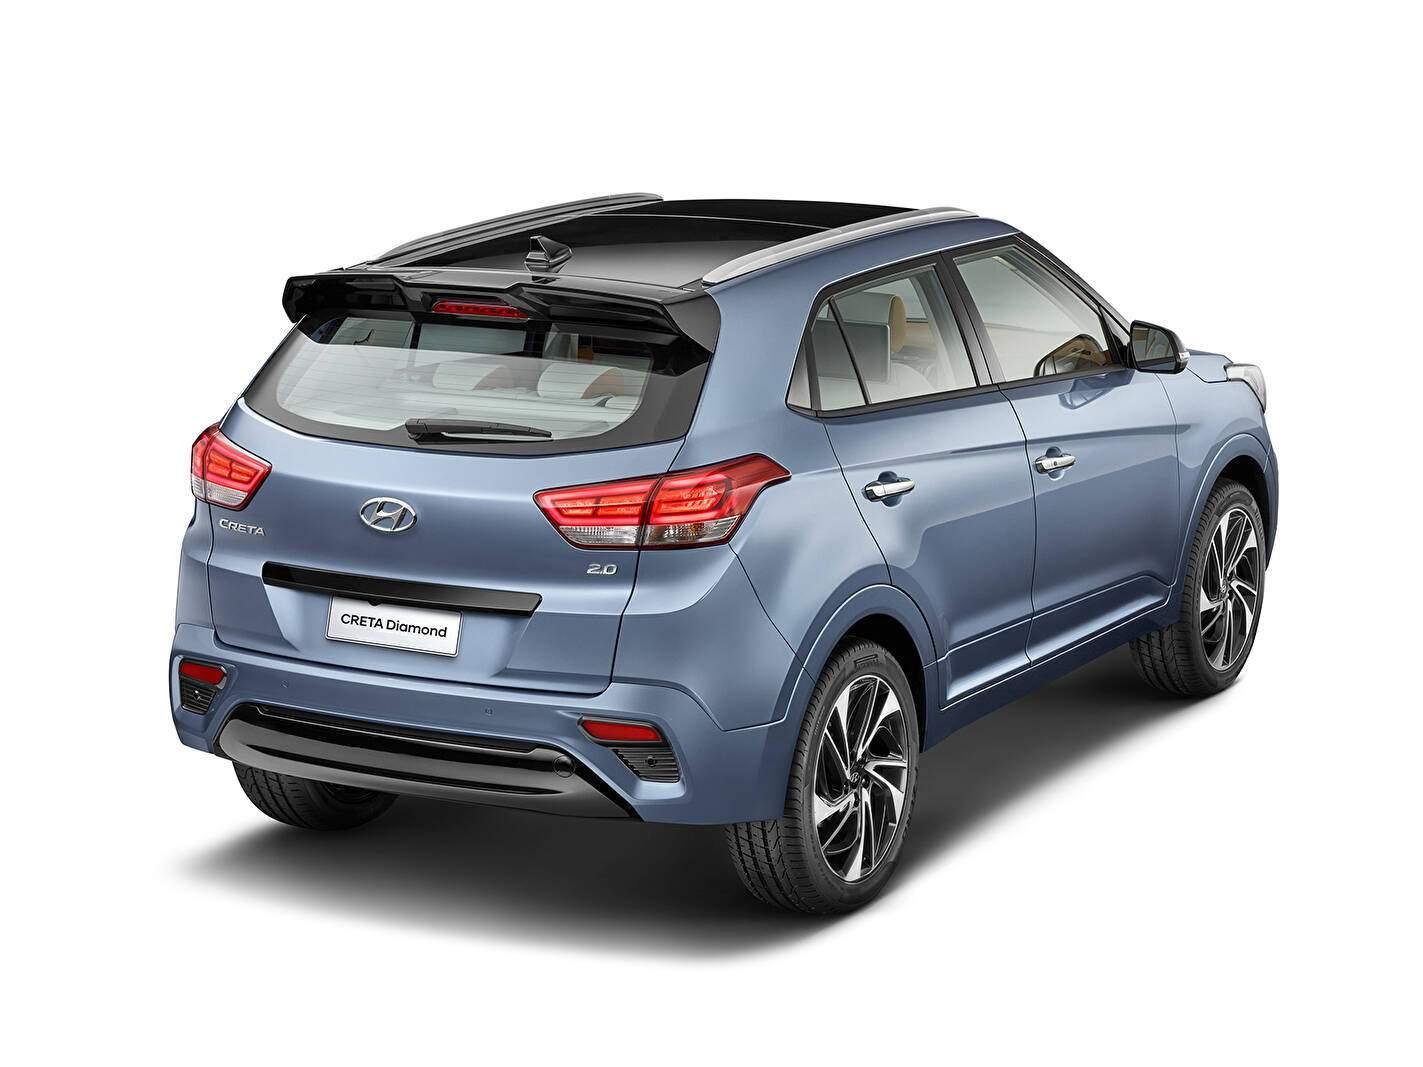 Hyundai Creta Diamond Concept (2018),  ajouté par fox58